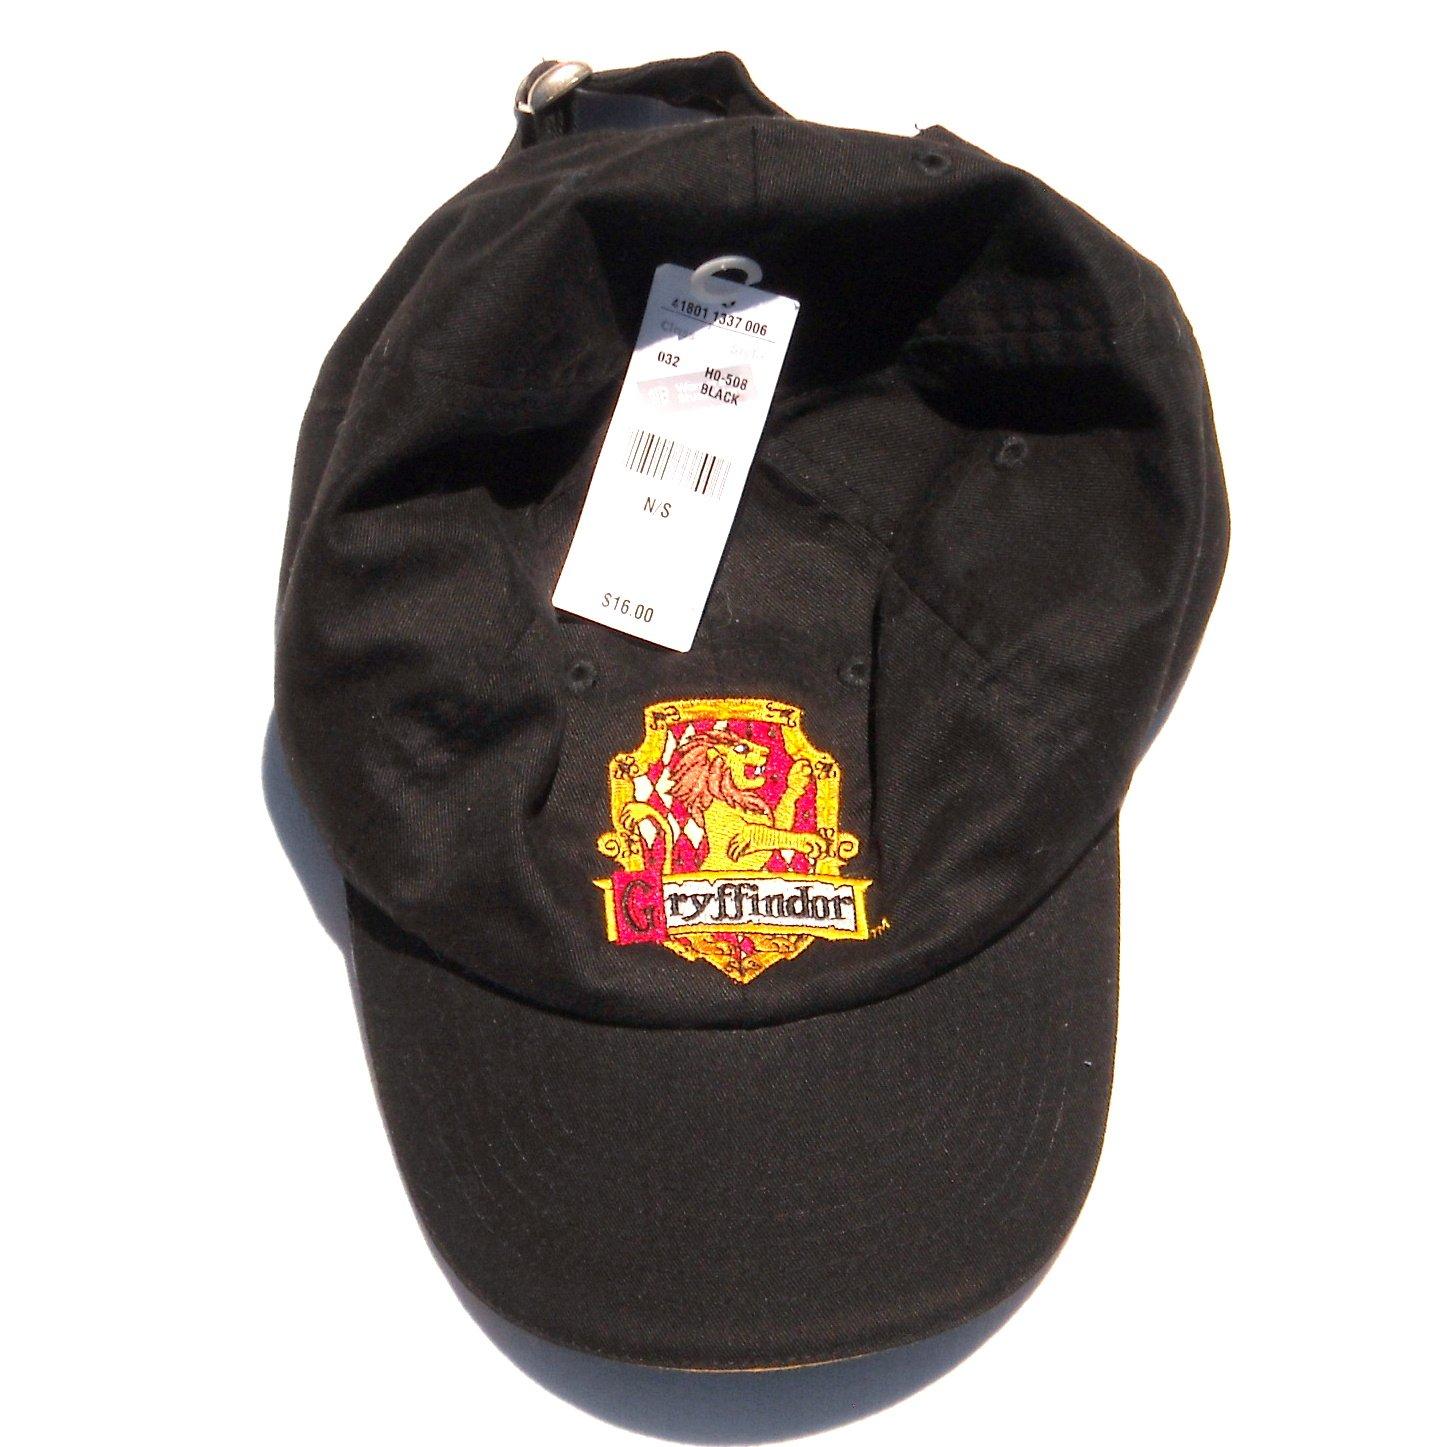 Harry Potter Warner Movie Studios Gryffindor Black Cap